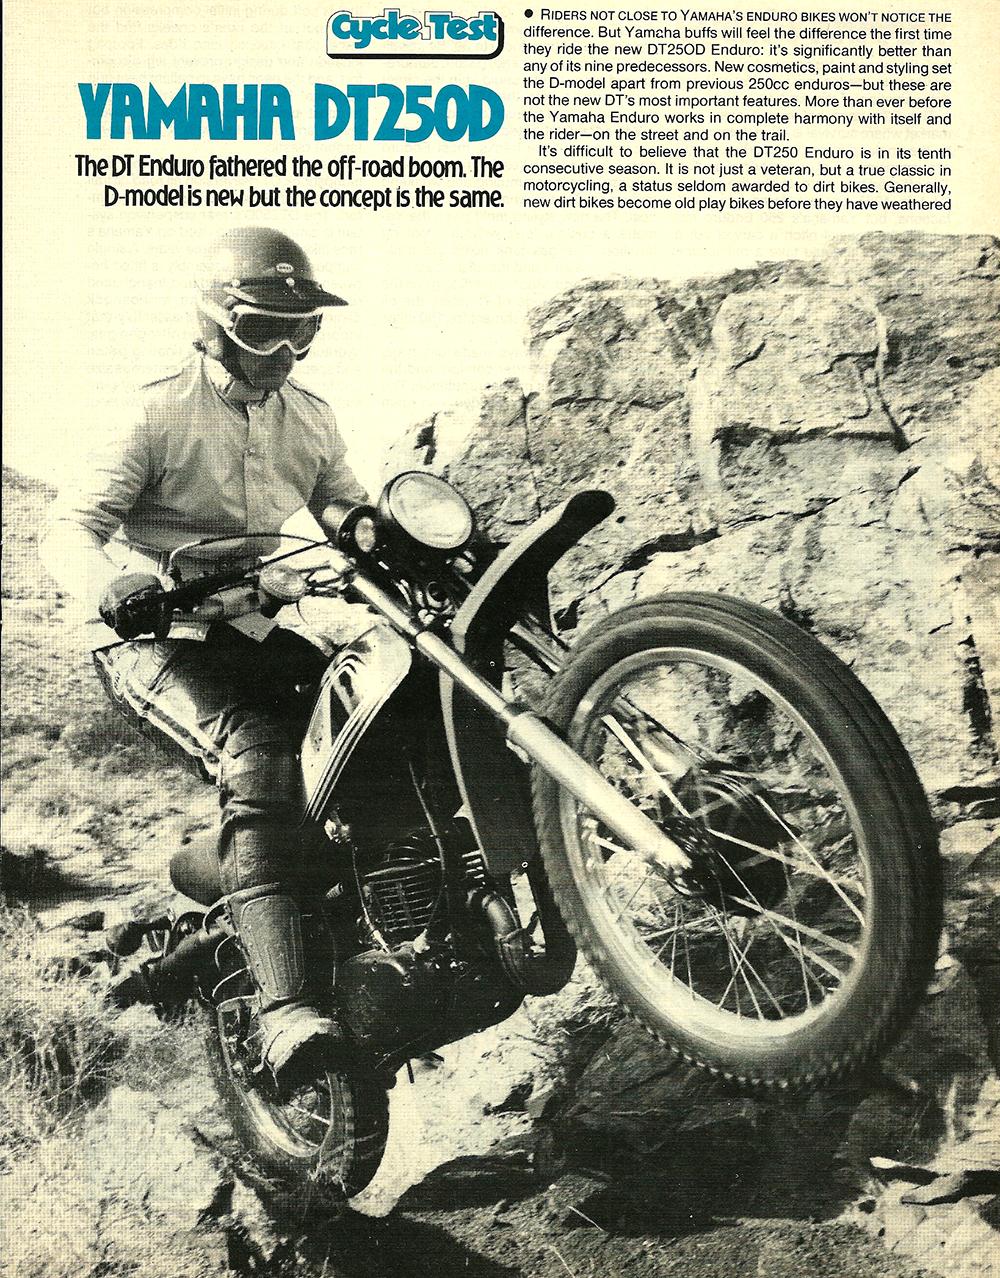 1977 Yamaha DT250D road test 1.jpg